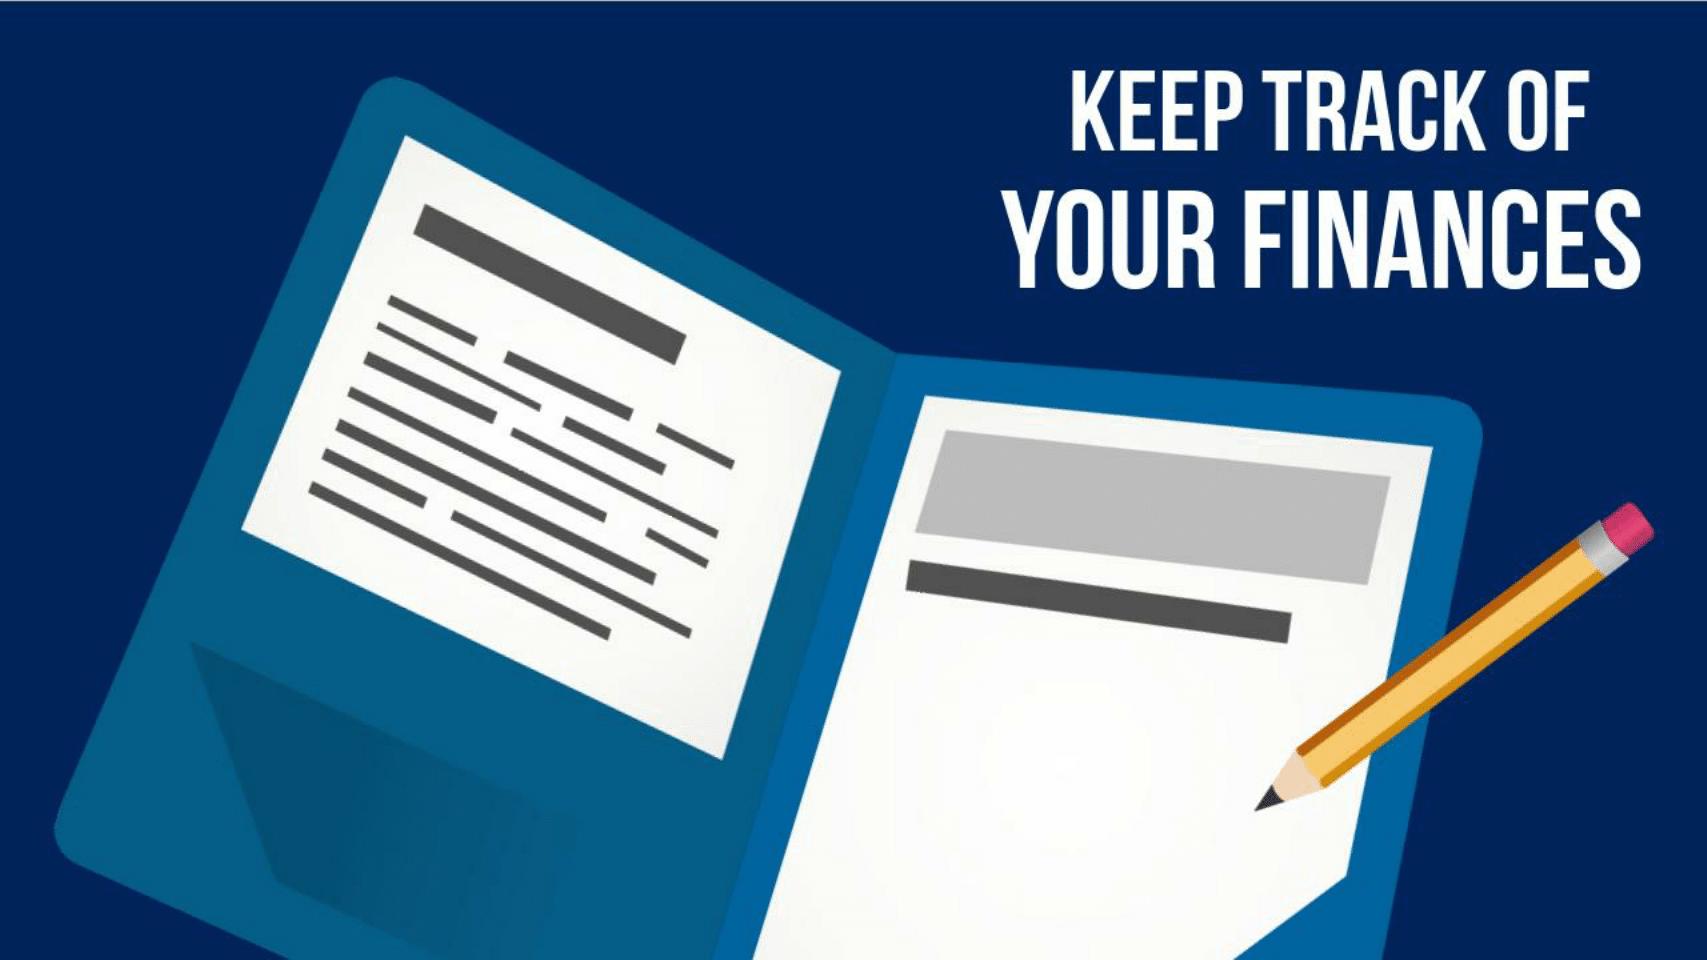 online-entrepreneur-track-finances